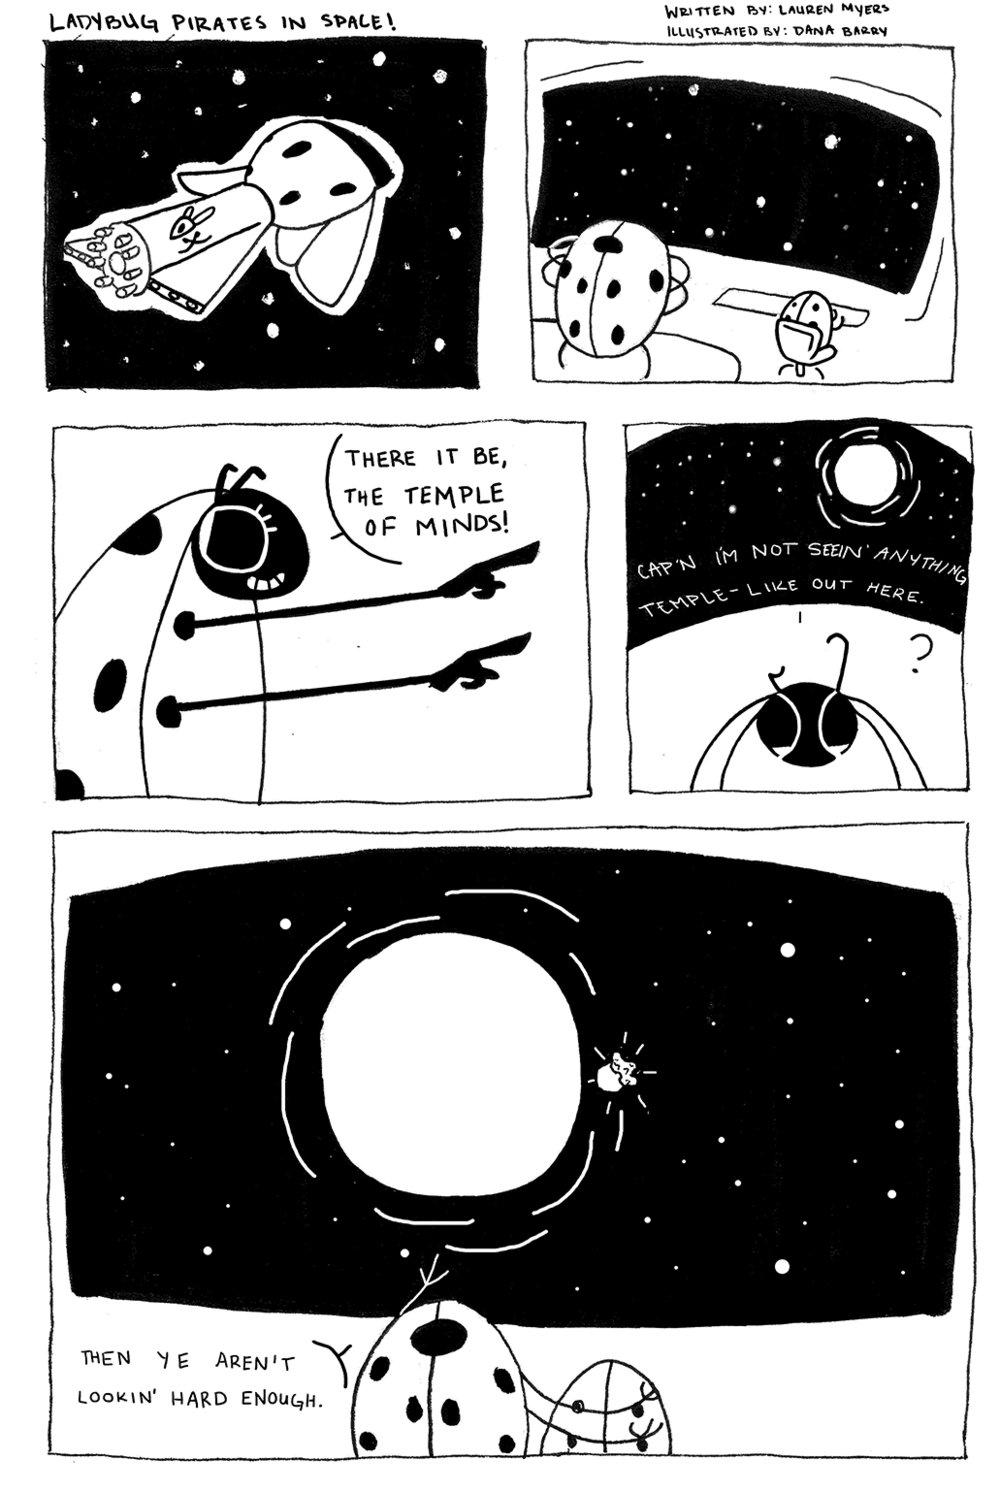 Ladybug Pirates in Space! fw.jpg